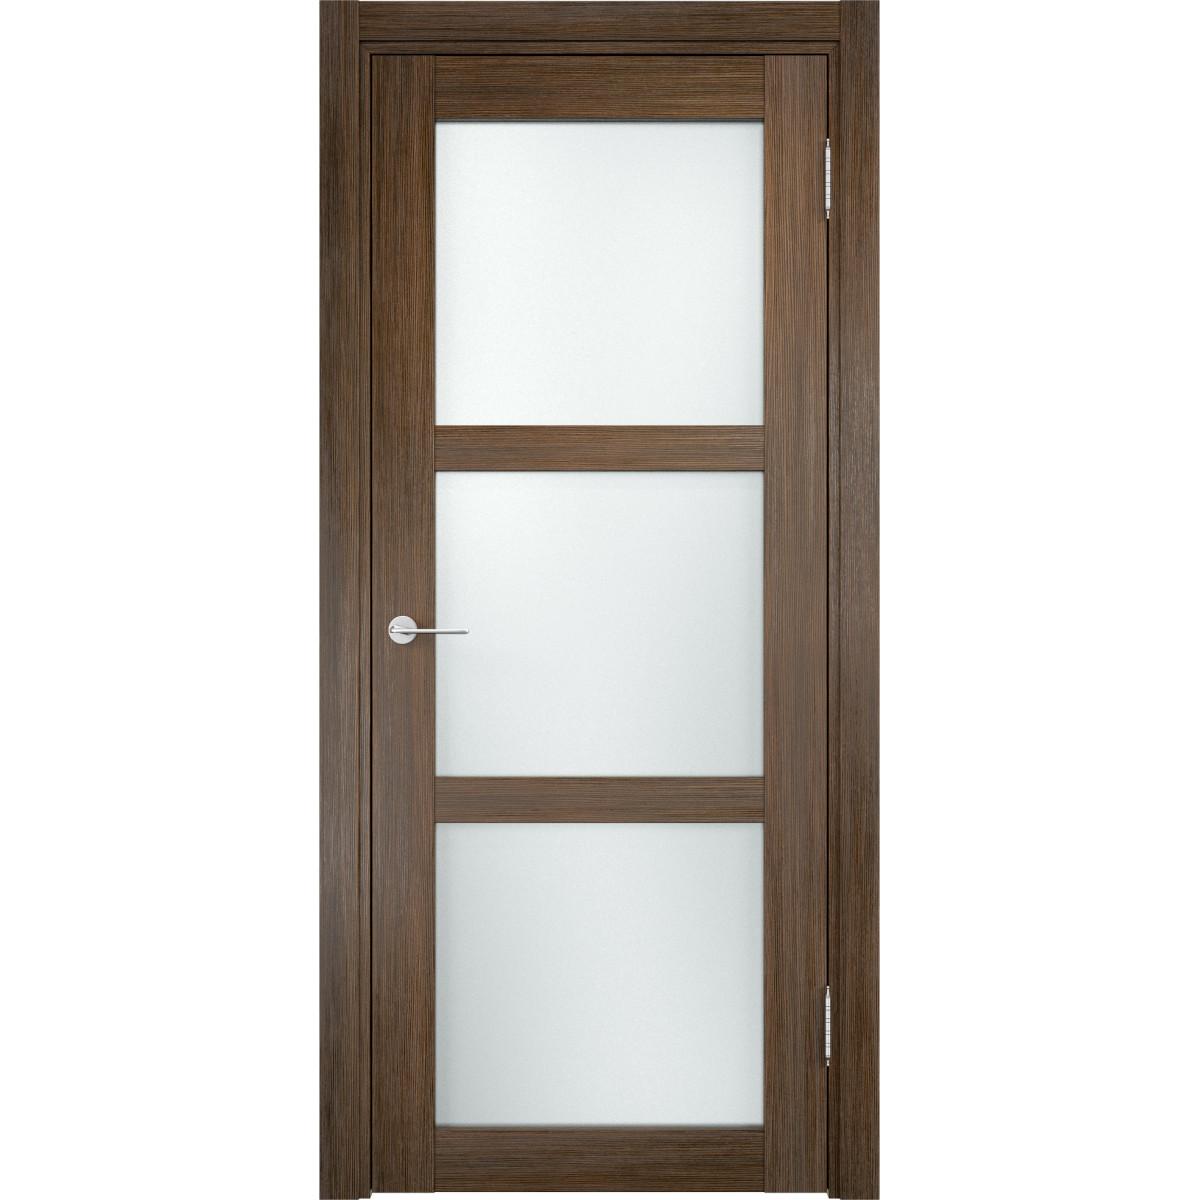 Дверное полотно Casaporte Рома МП_0111 2000х700х44 мм МДФ